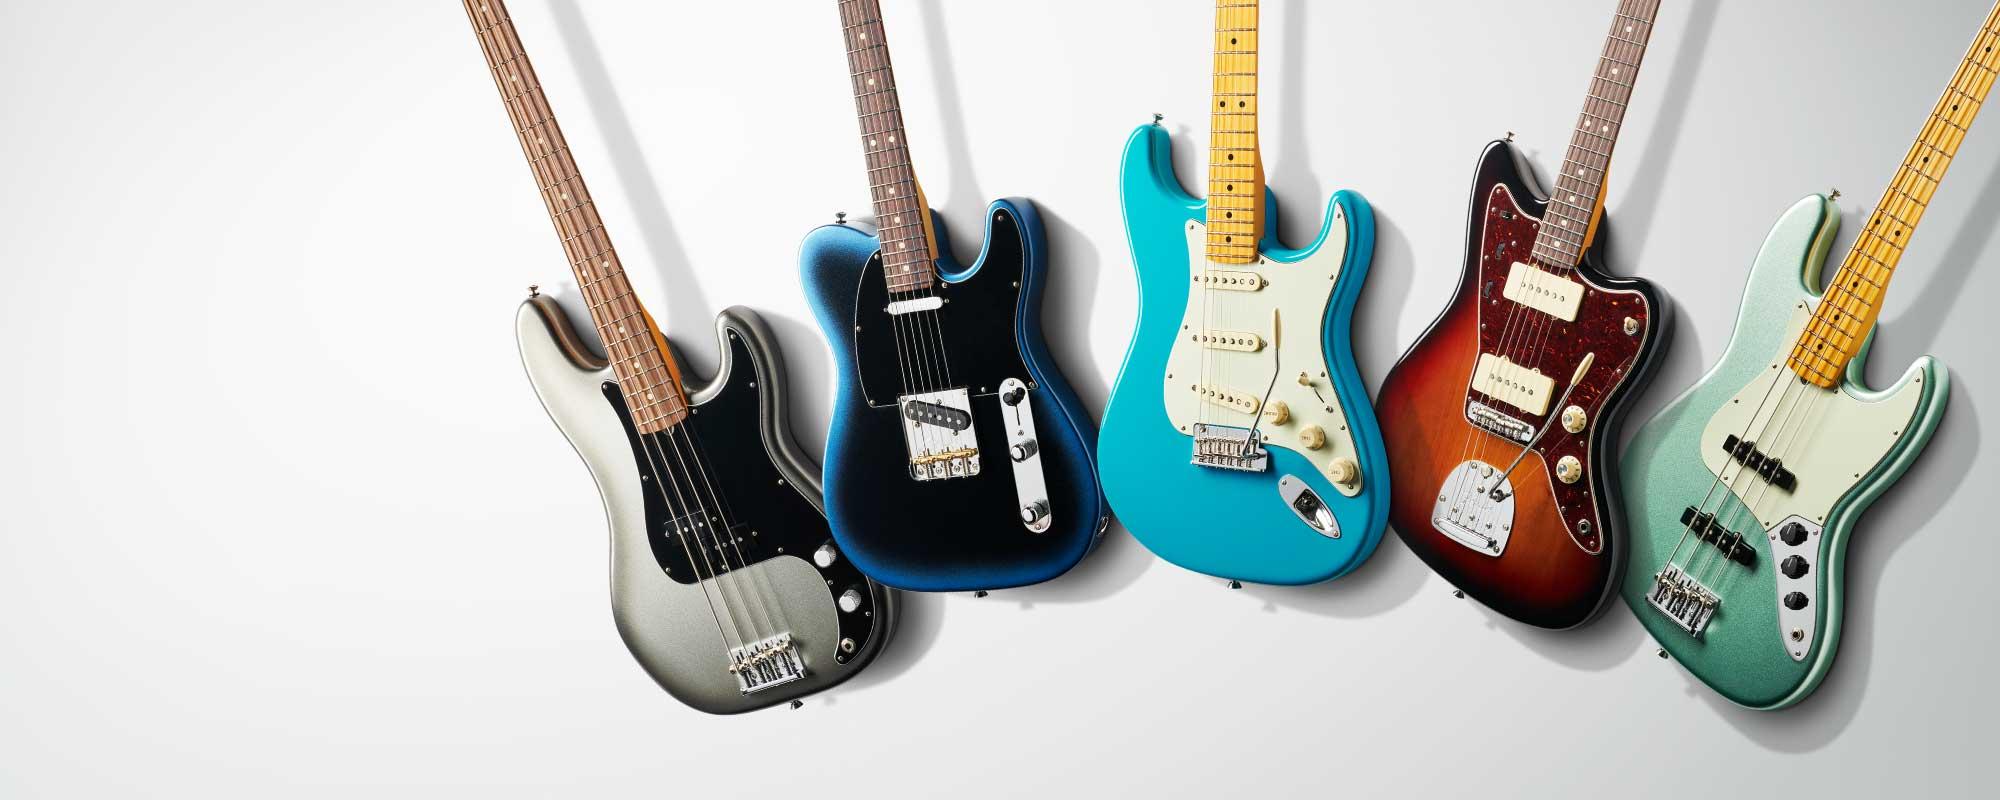 Fender AMERICAN PROFESSIONAL II